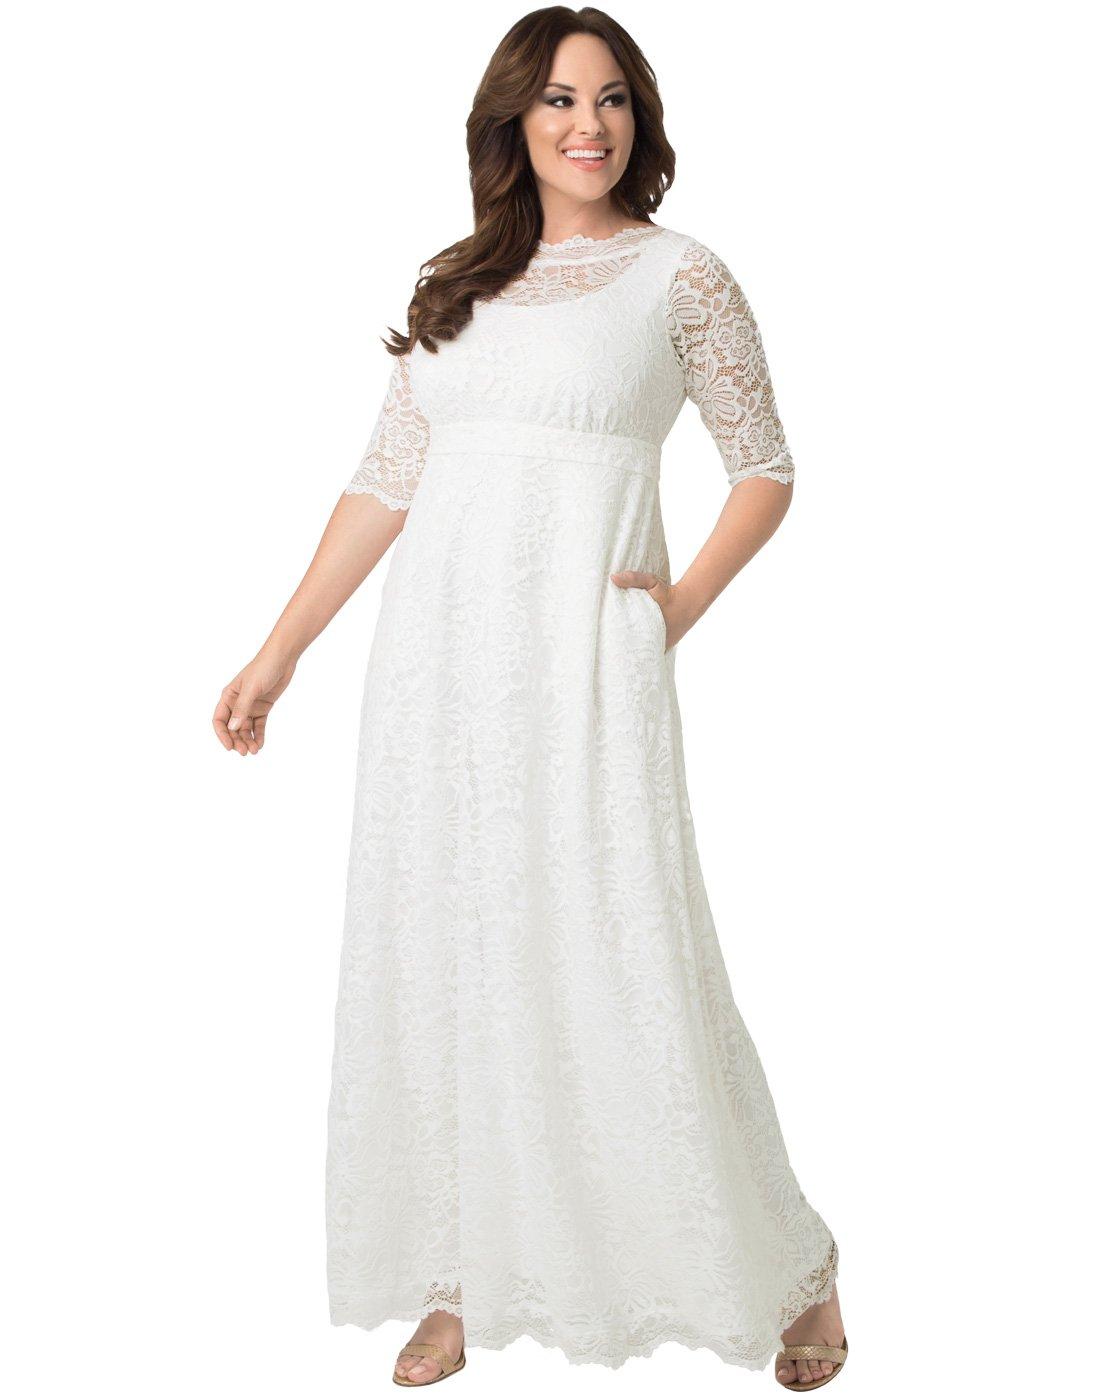 Kiyonna Women's Plus Size Sweet Serenity Wedding Gown 1X Ivory